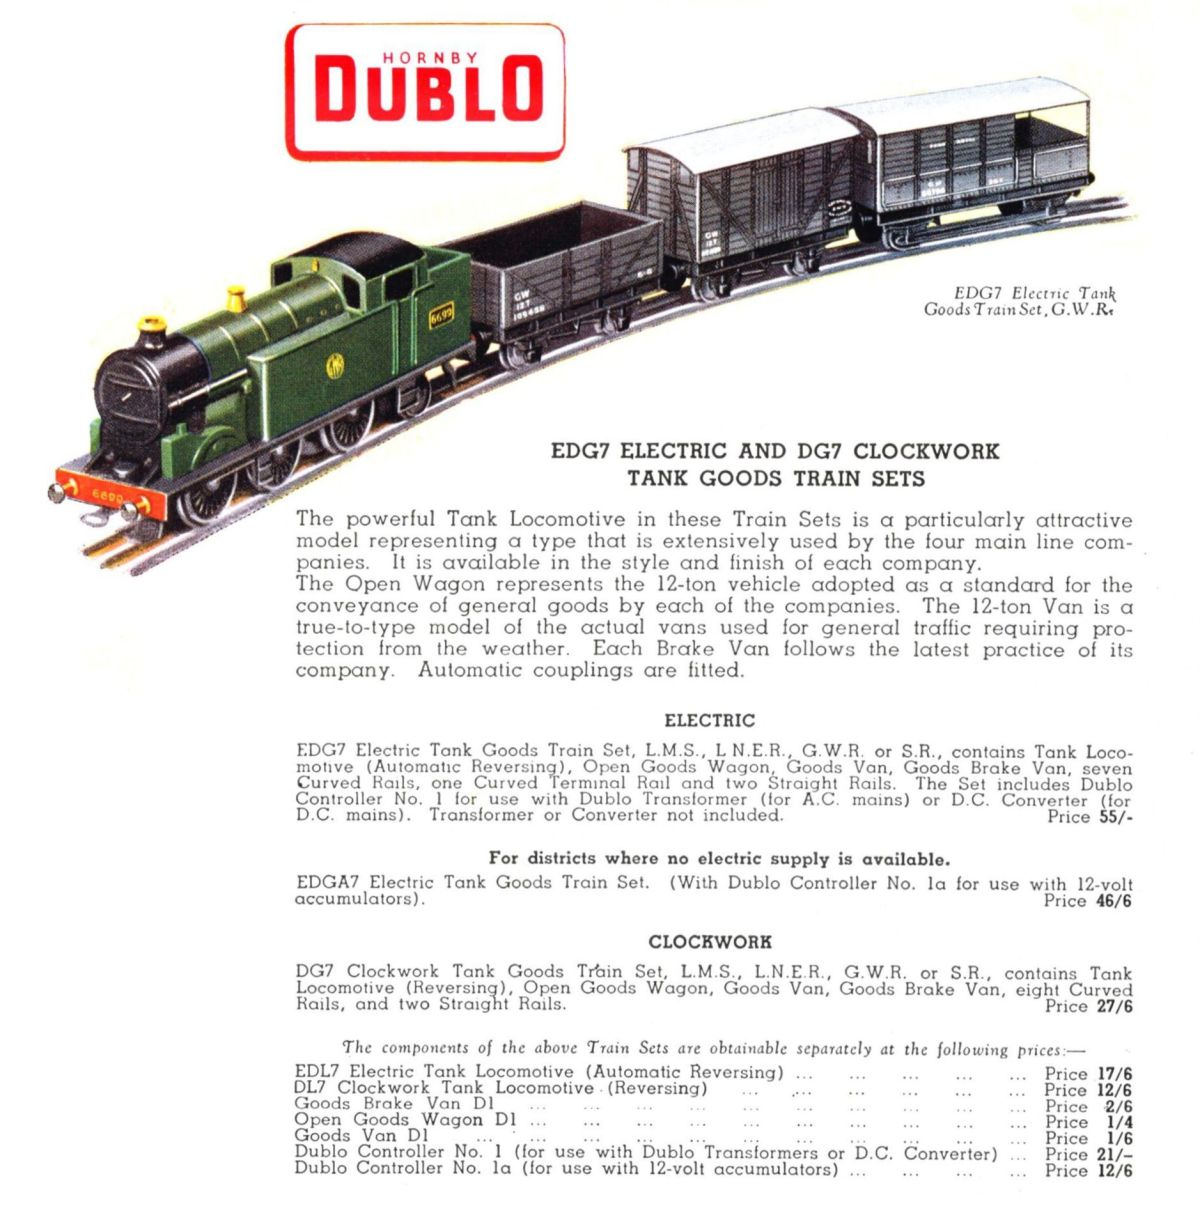 Goods Train Set, SR (Hornby Dublo EDG7) - The Brighton Toy